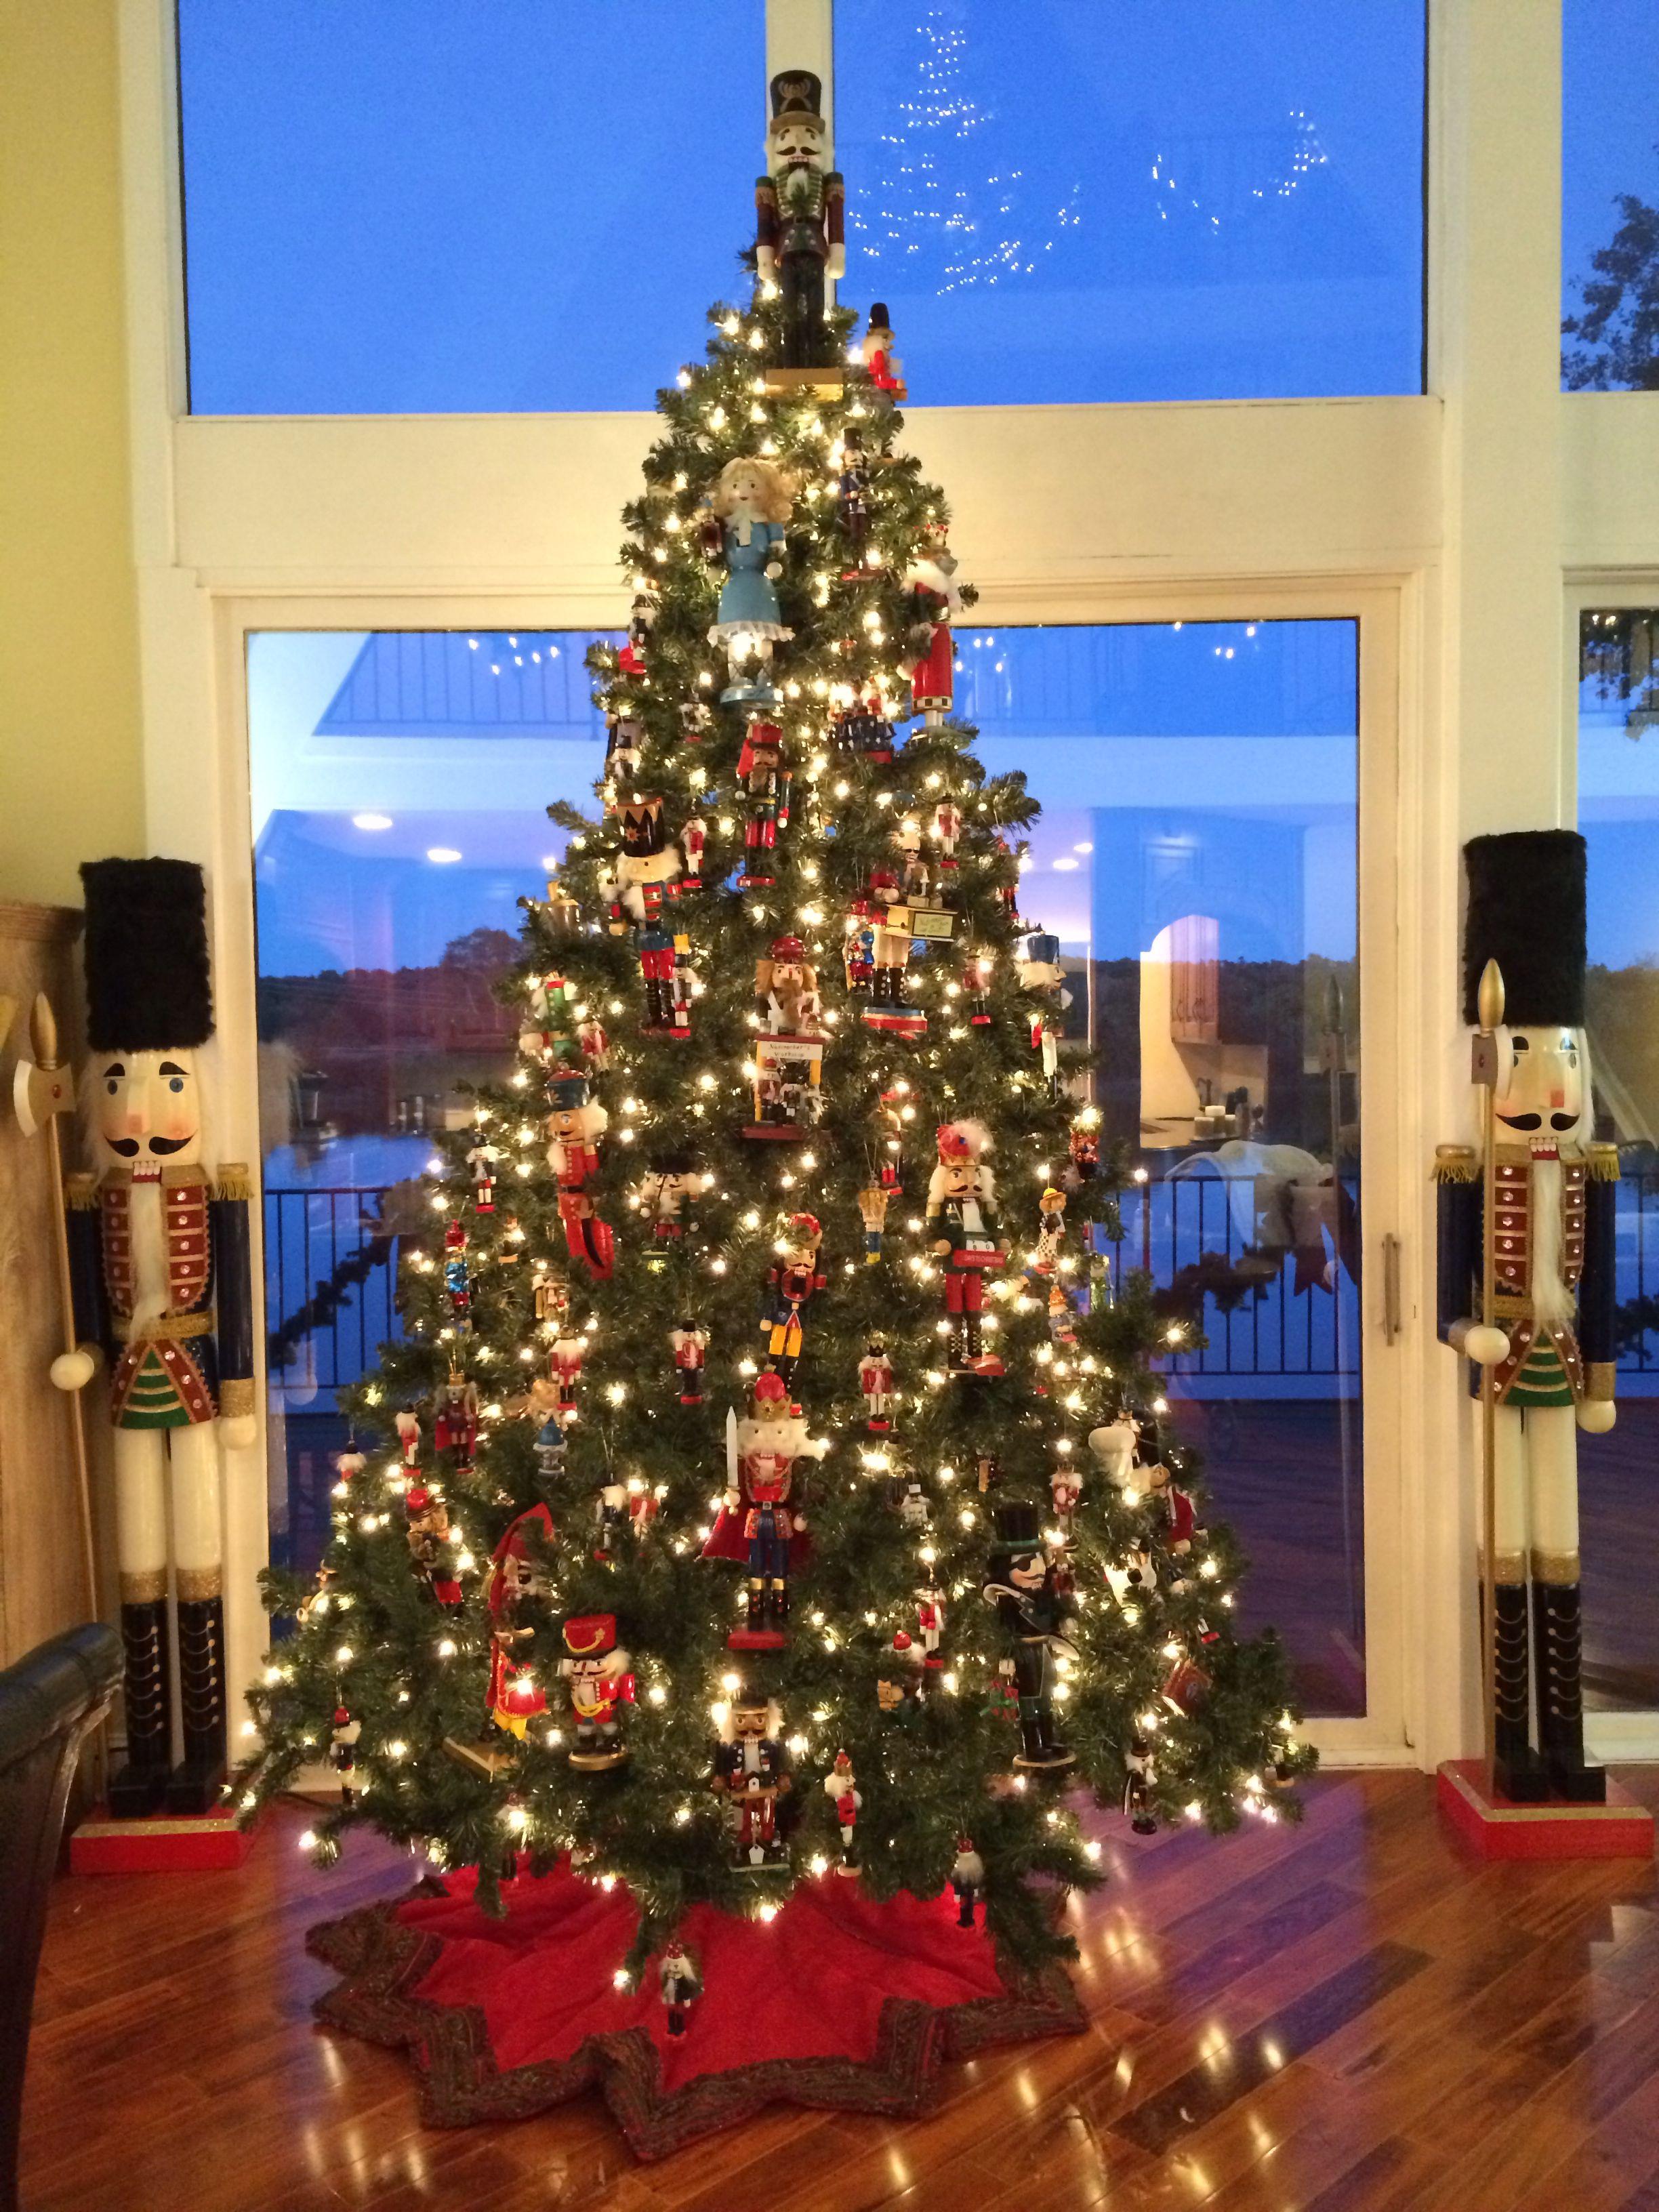 Nutcracker Christmas Tree Christmas Tree Themes Nutcracker Christmas Tree Holiday Christmas Tree